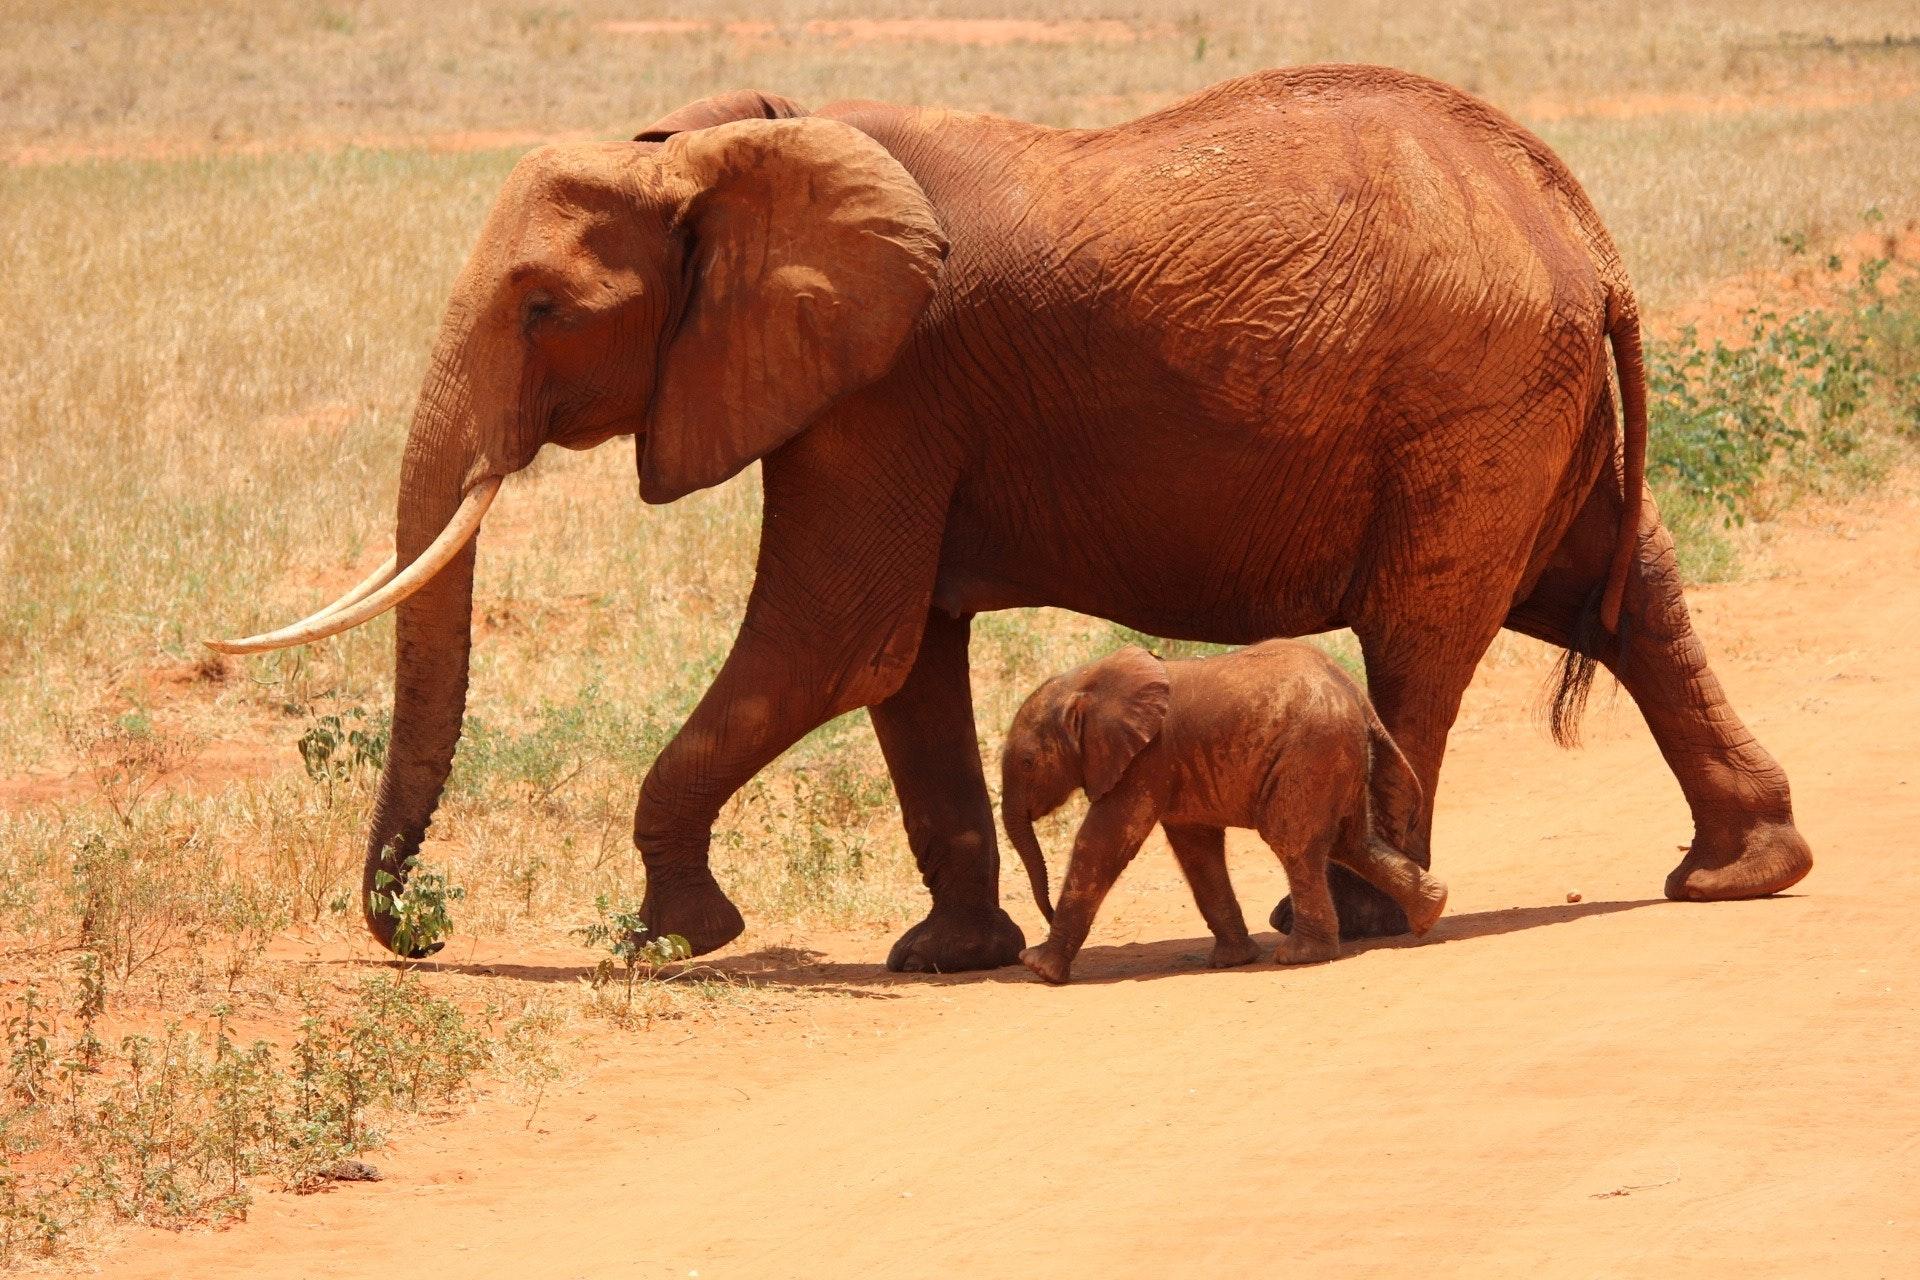 animals-calf-elephants-66898.jpg